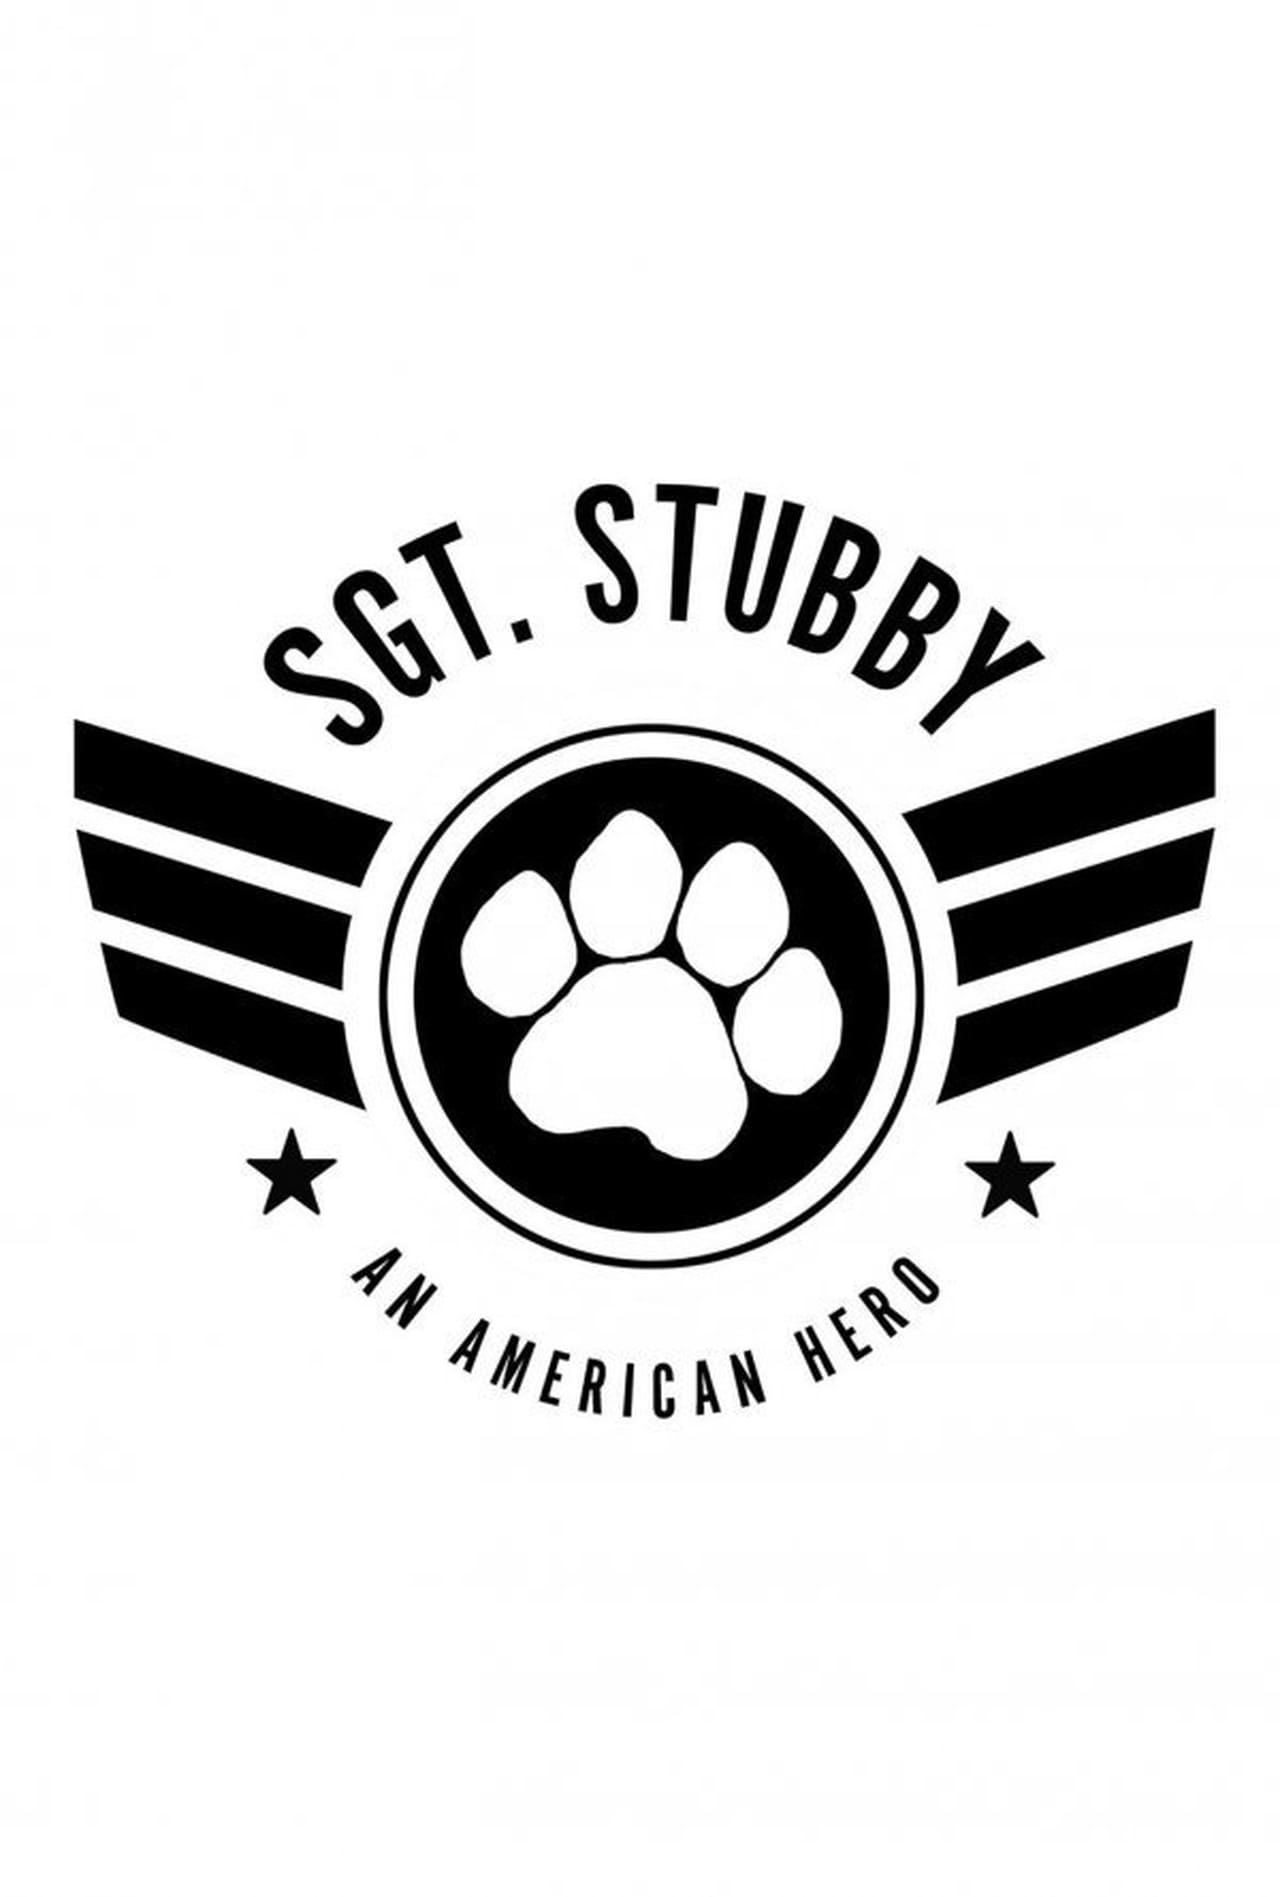 Watch Free Sgt Stubby An American Hero Full